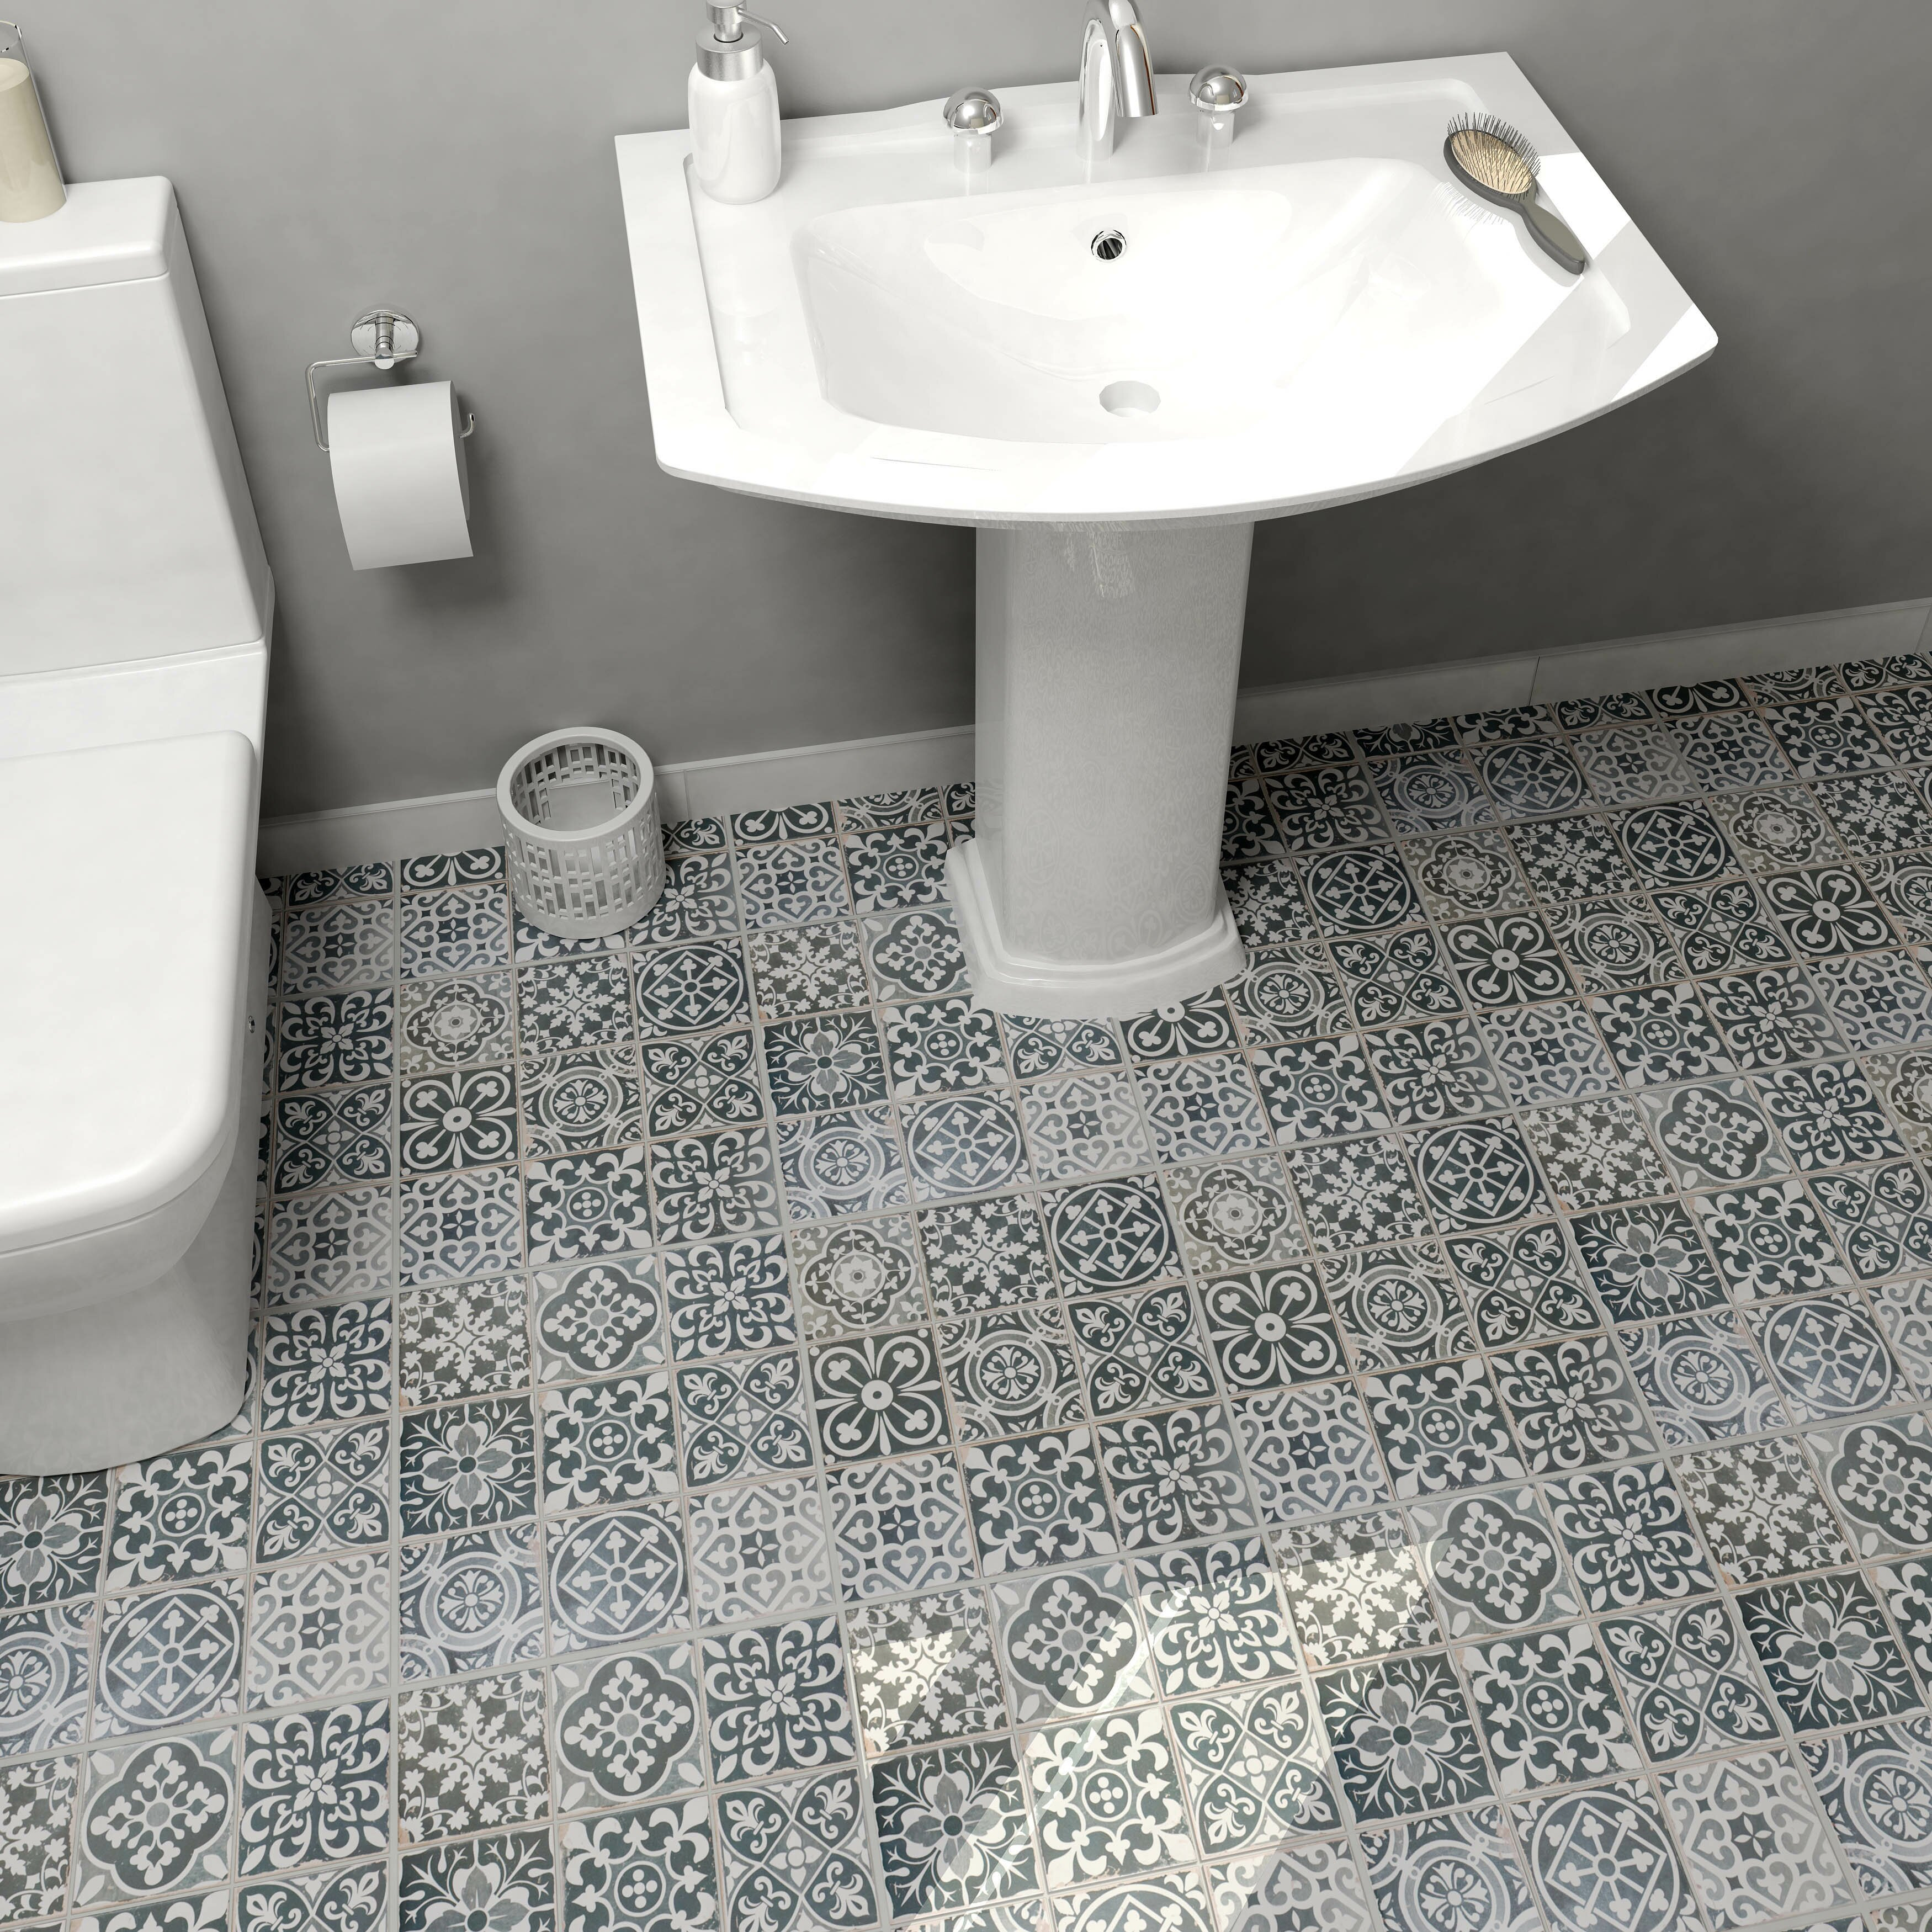 Elitetile faventie nero 13 x 13 ceramic field tile in for 13 inch ceramic floor tile